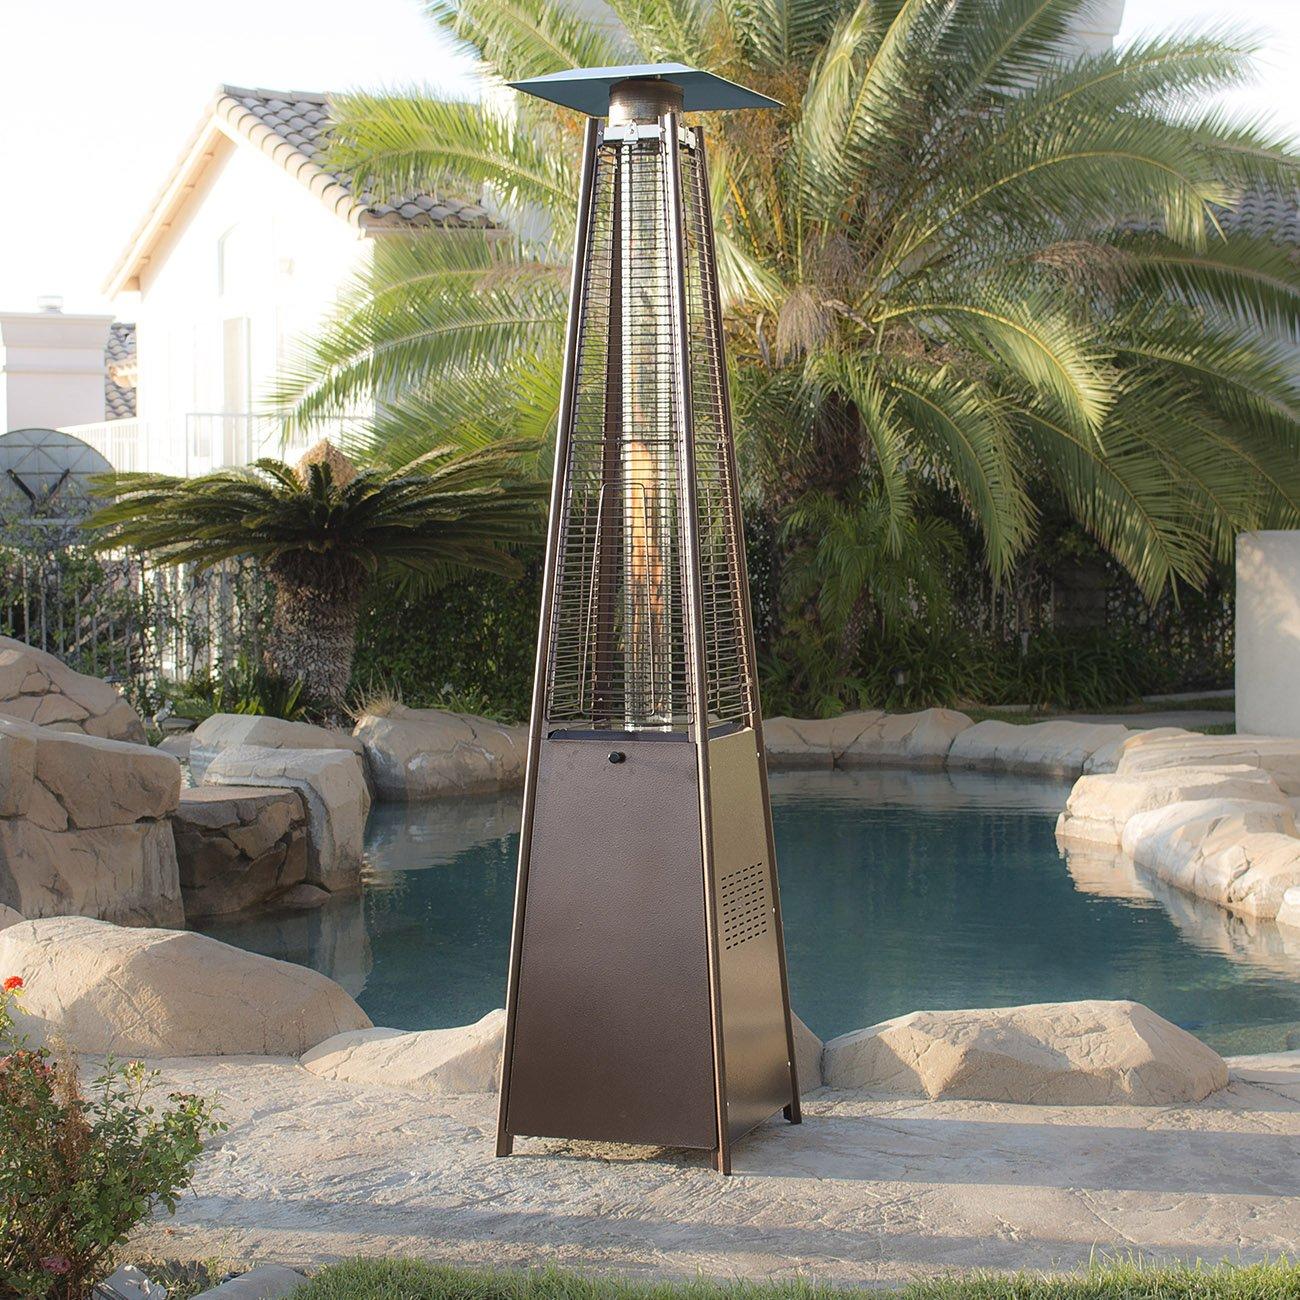 Belleze Patio Heater - Pyramid w/Dancing Flame, CSA Certified, 42,000 BTU- Hammered Bronze